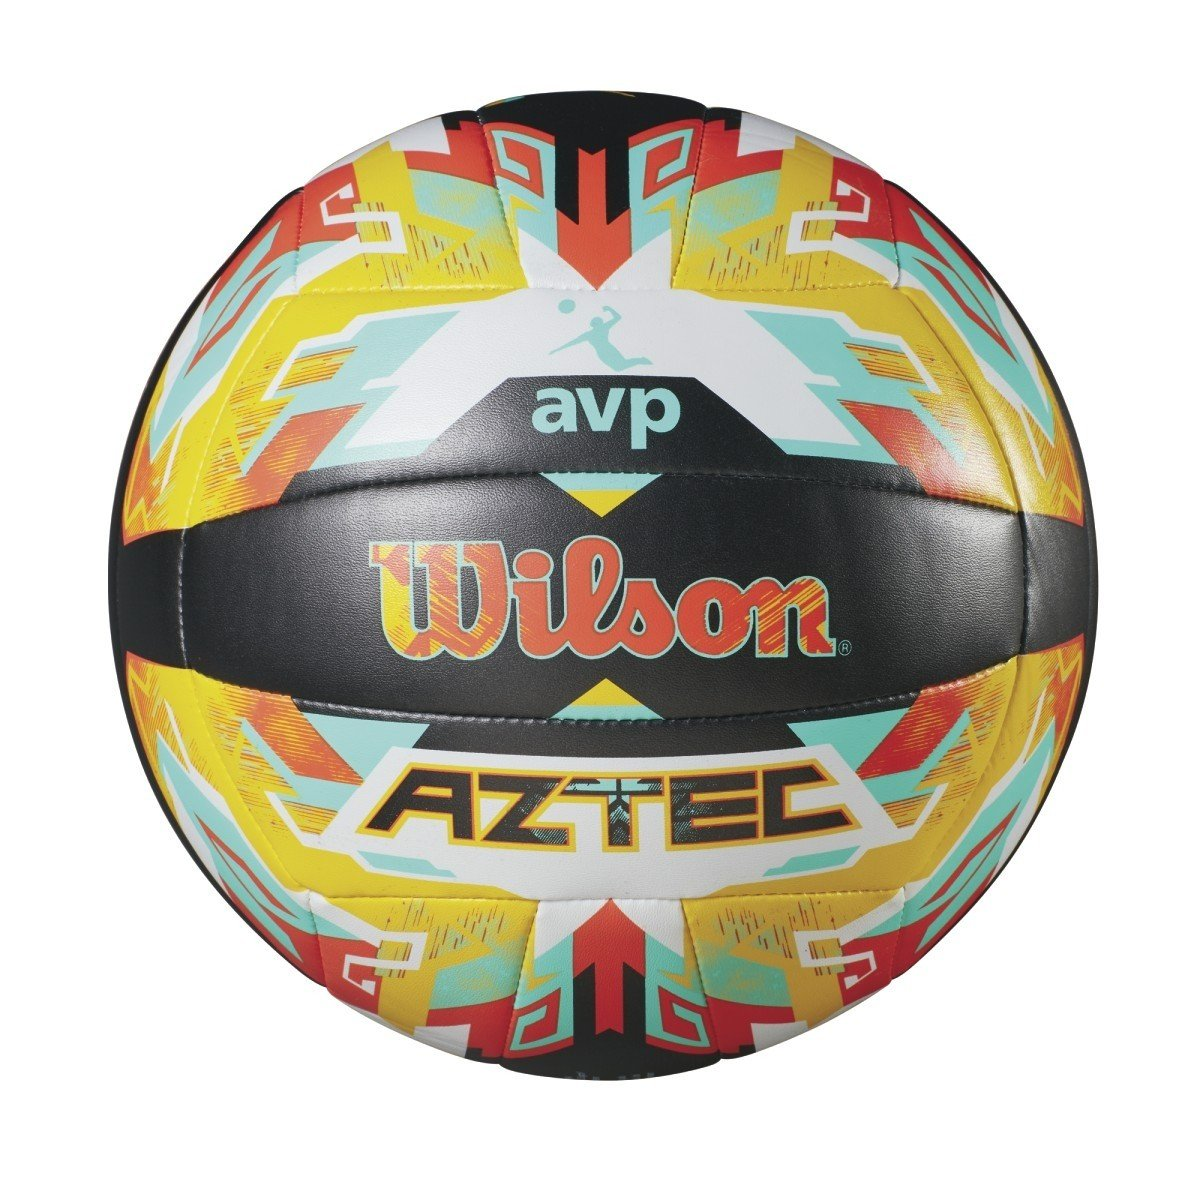 Wilson Pelota de vóley-playa, Exterior, Uso recreativo, Tamaño oficial, AVP AZTEC, Naranja/Azul, WTH5682XB